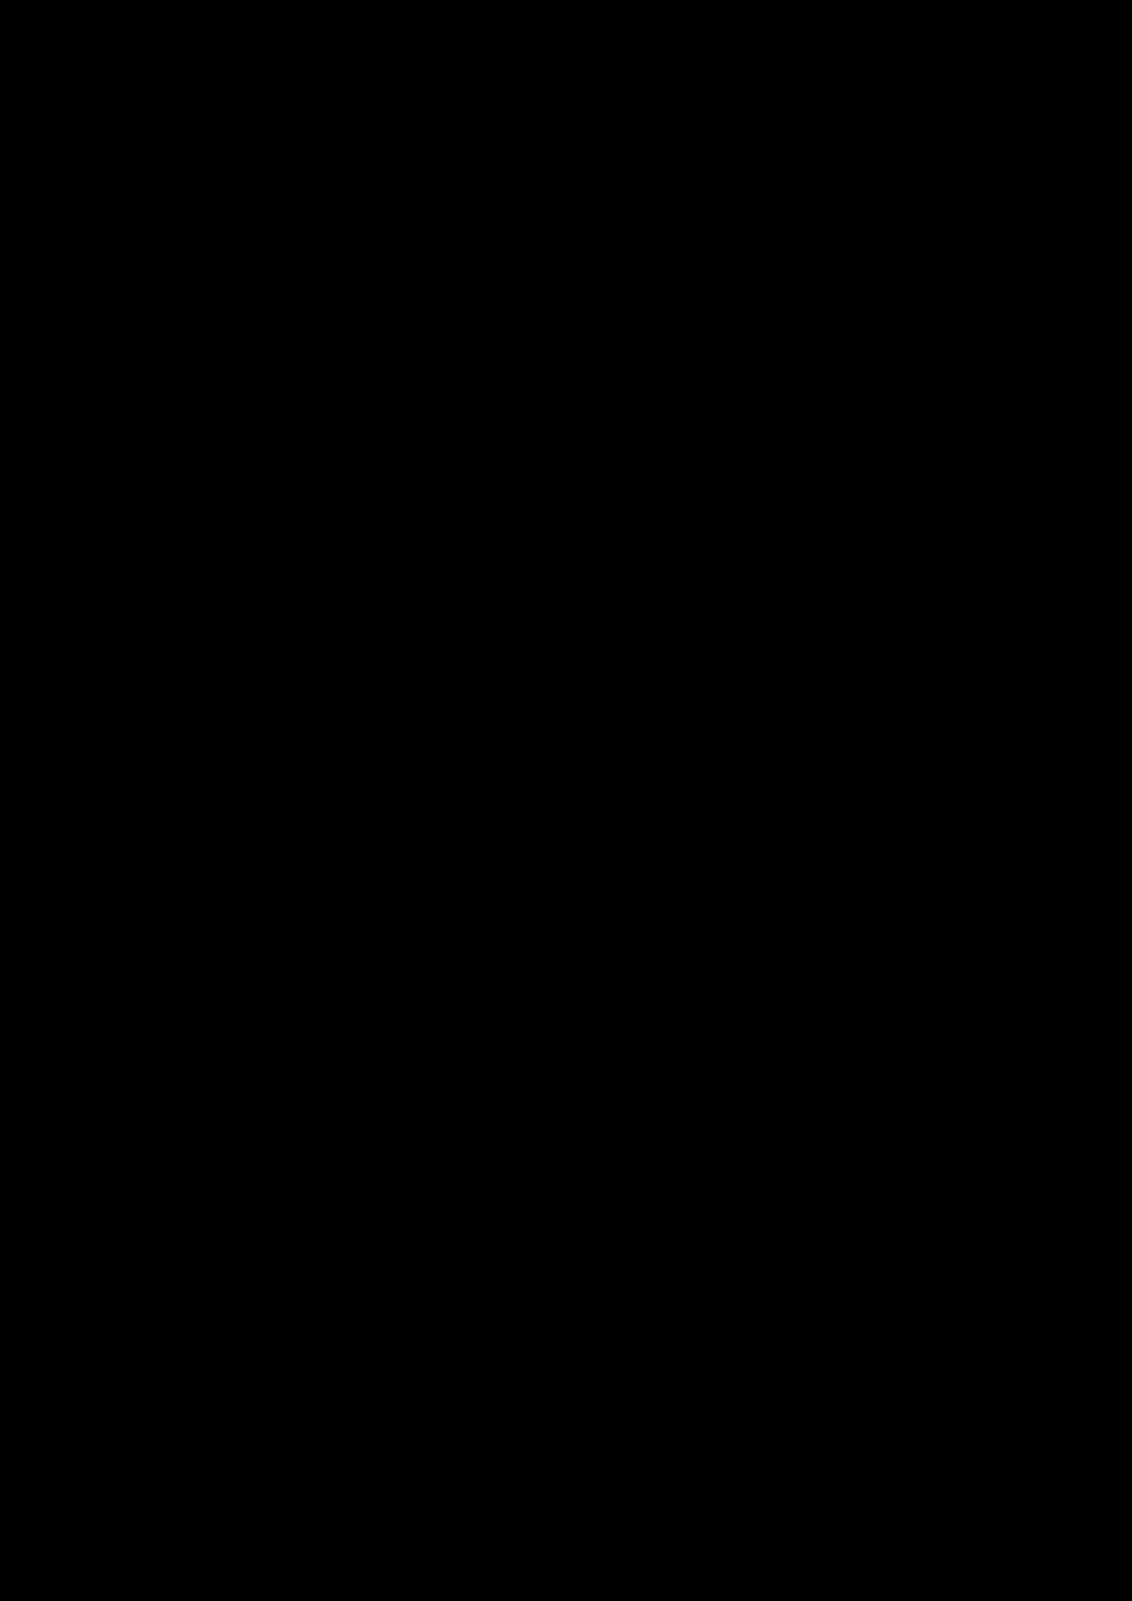 Korolevstvo slez slide, Image 13